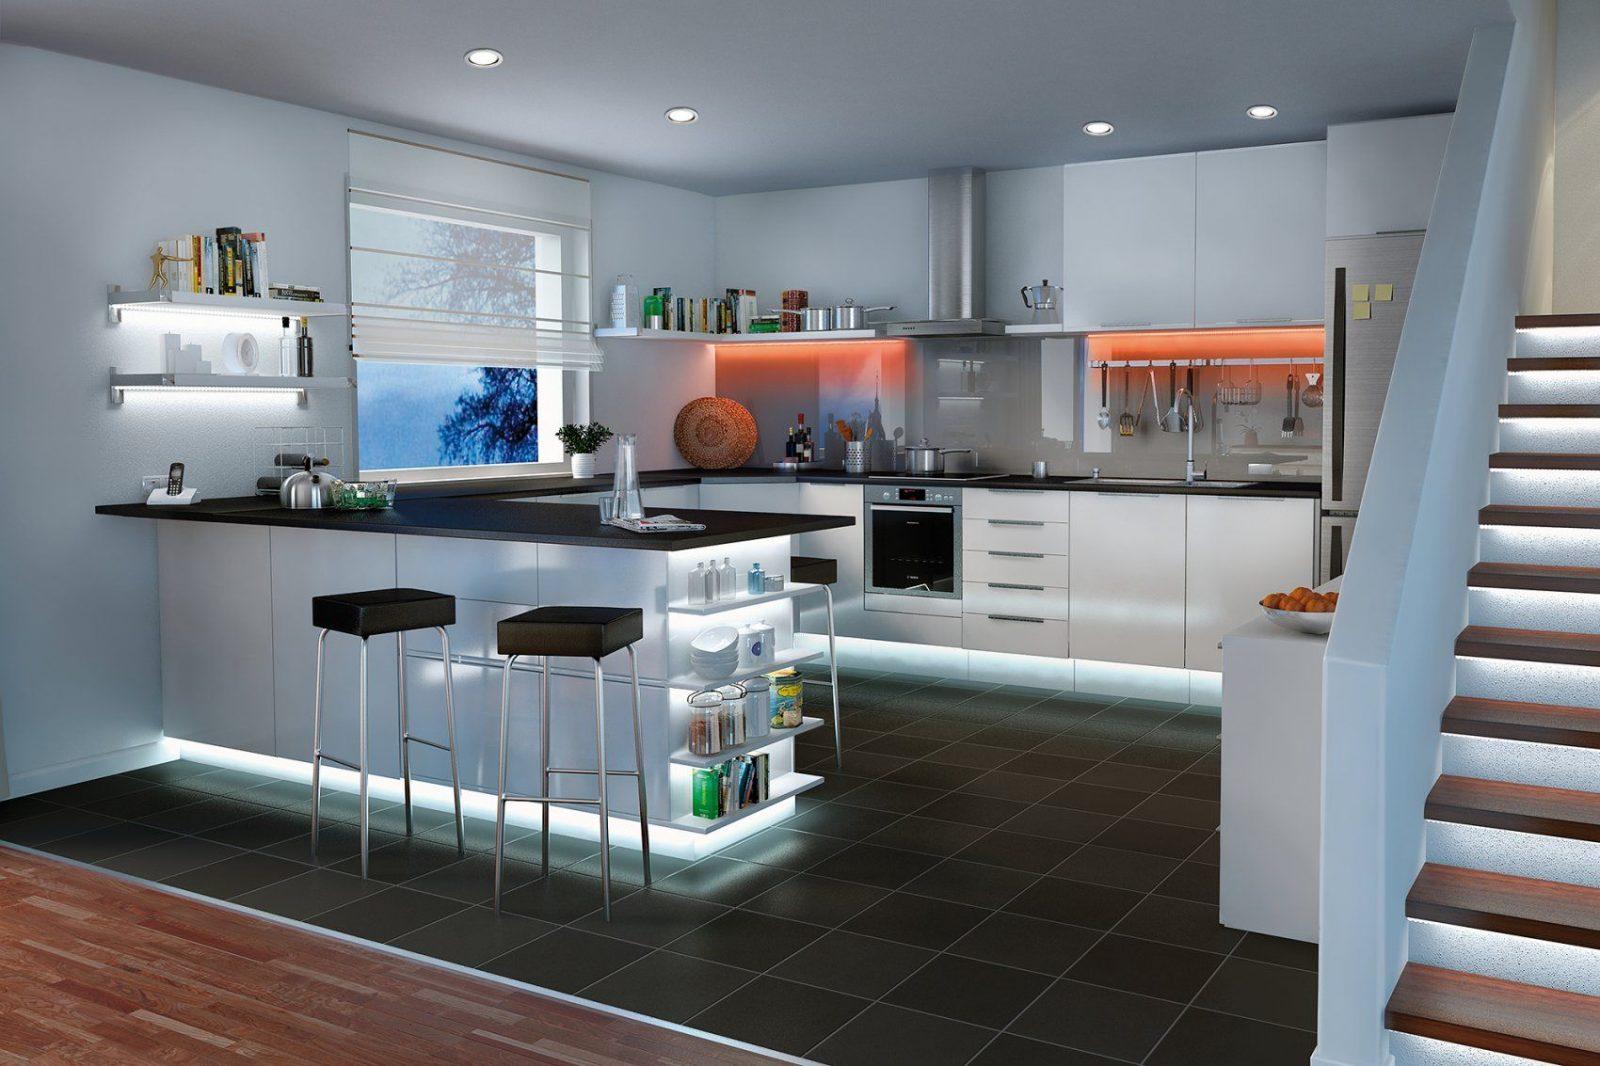 Abgehängte Decke Küche Spots   Decke Abhängen Mit Dachlatten And ...